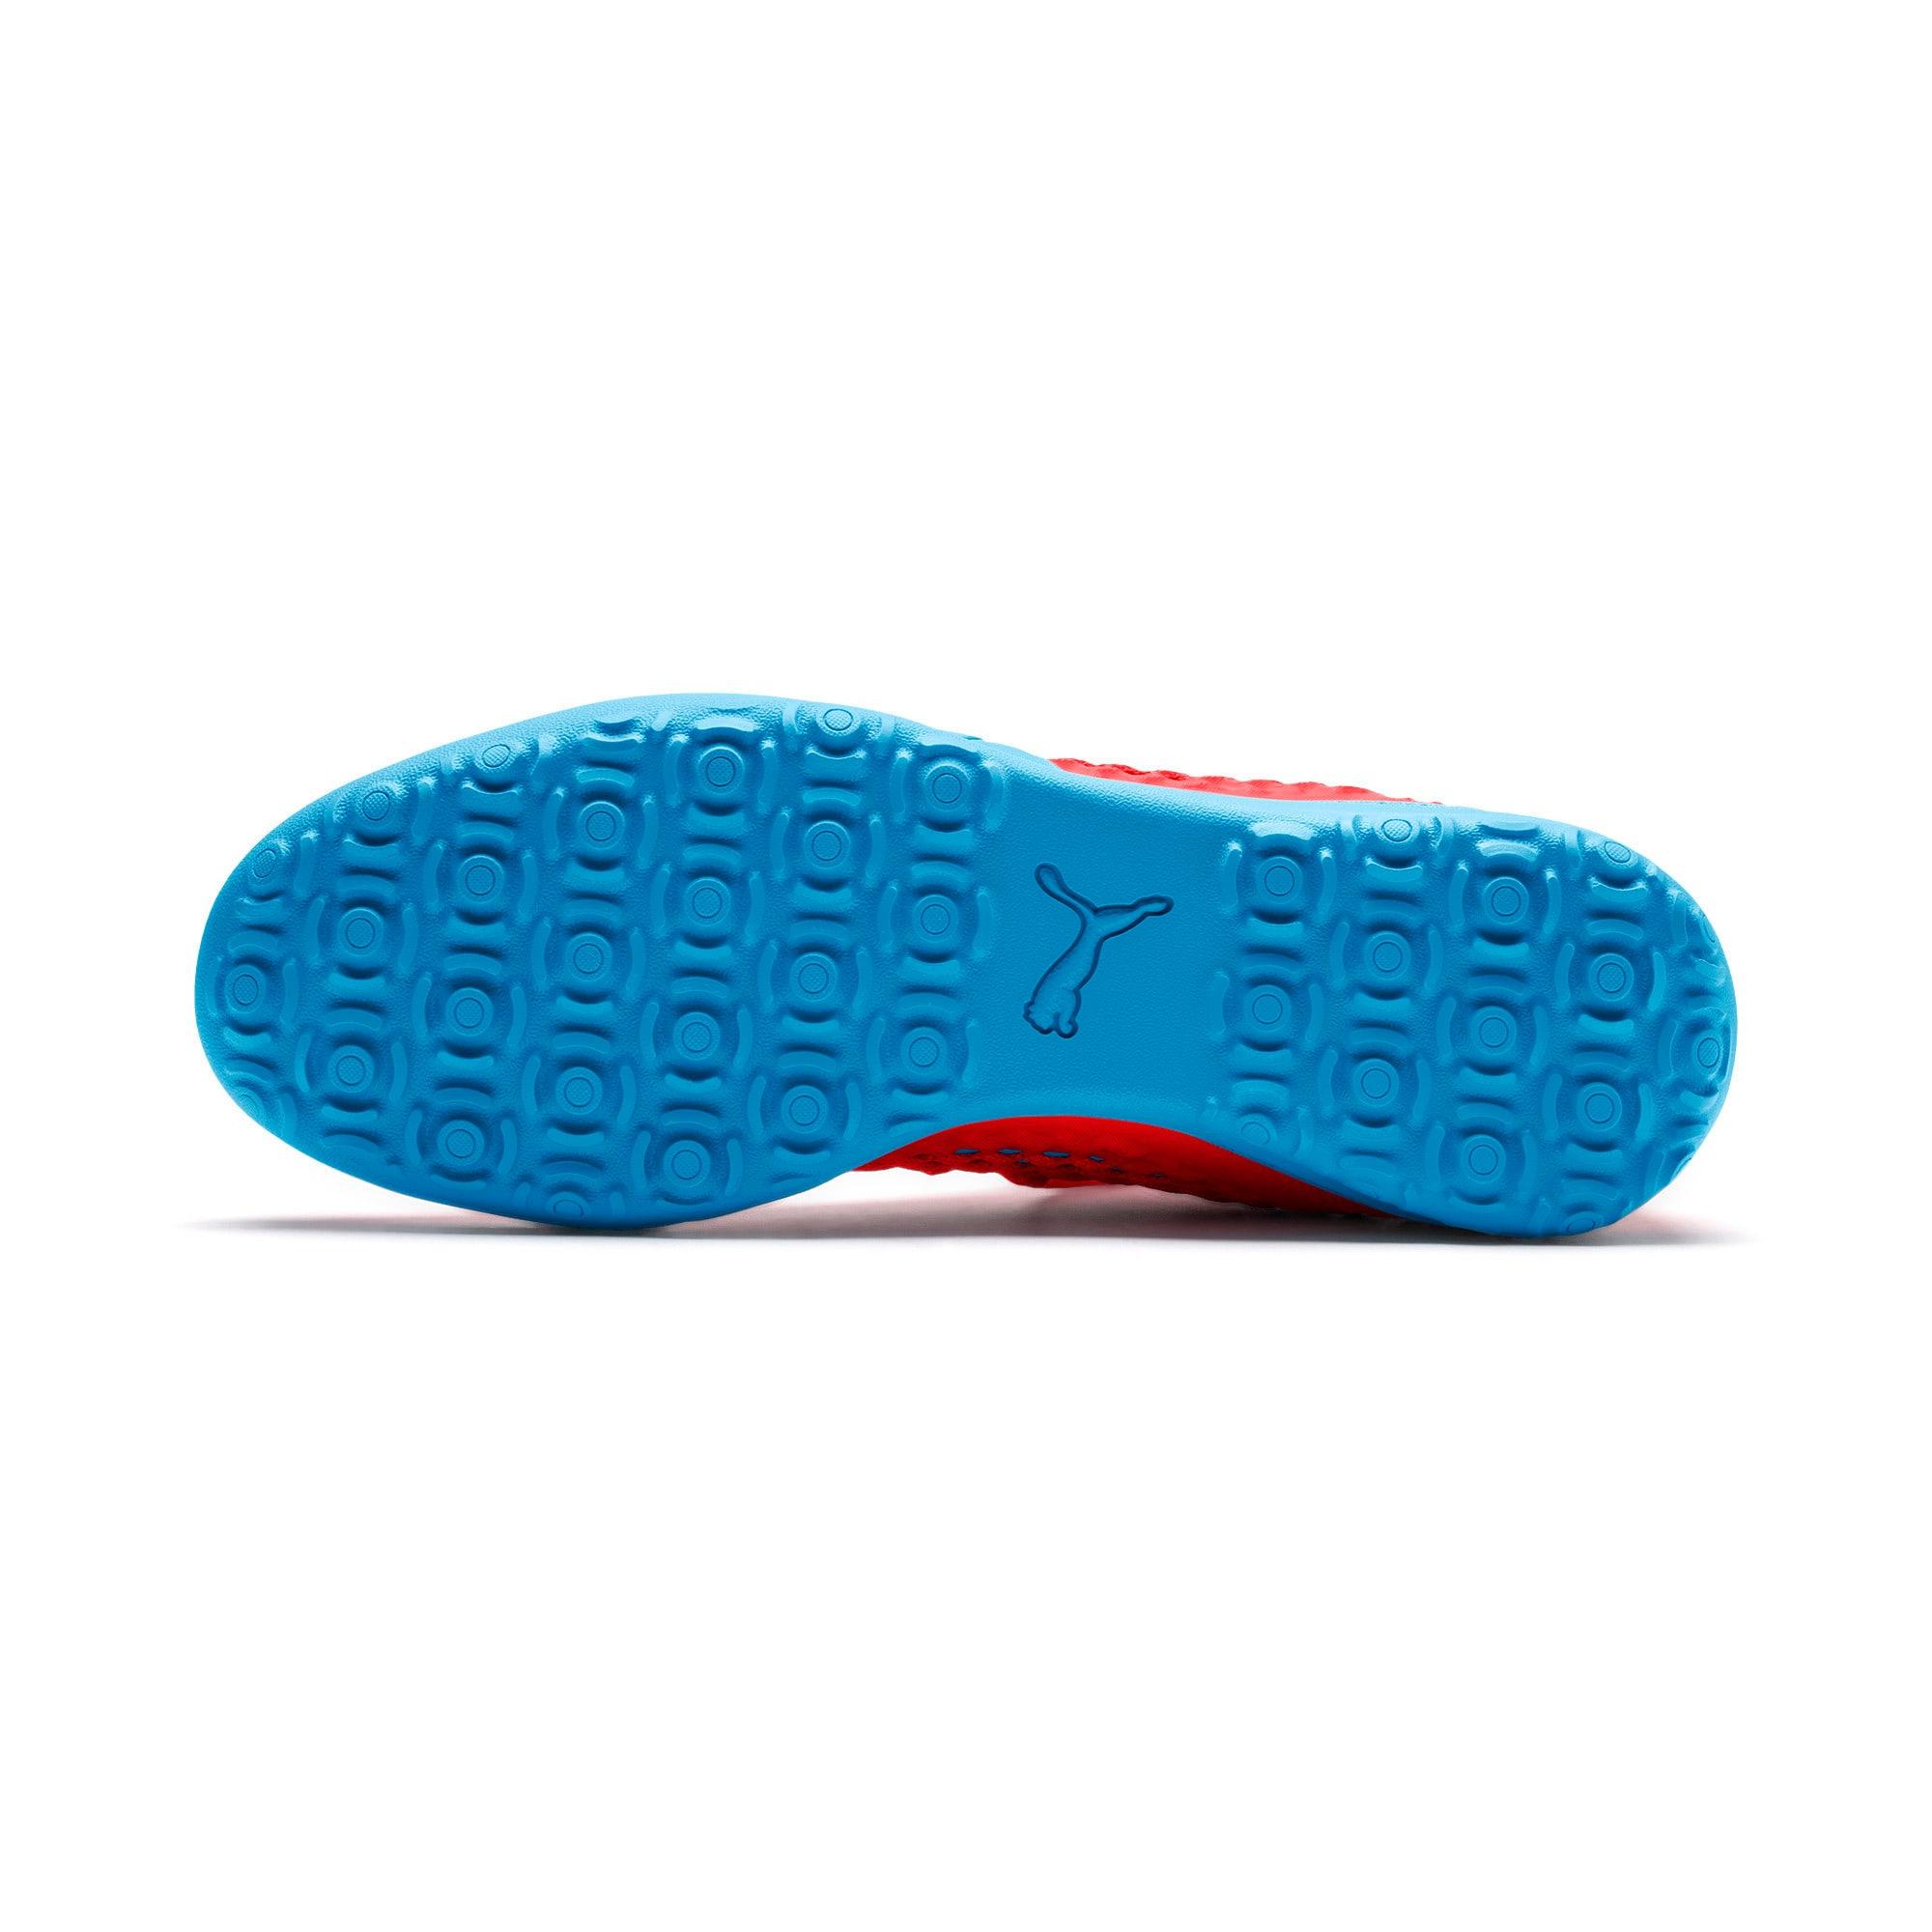 Thumbnail 5 of FUTURE 19.3 NETFIT TT Men's Soccer Shoes, Red Blast-Bleu Azur, medium